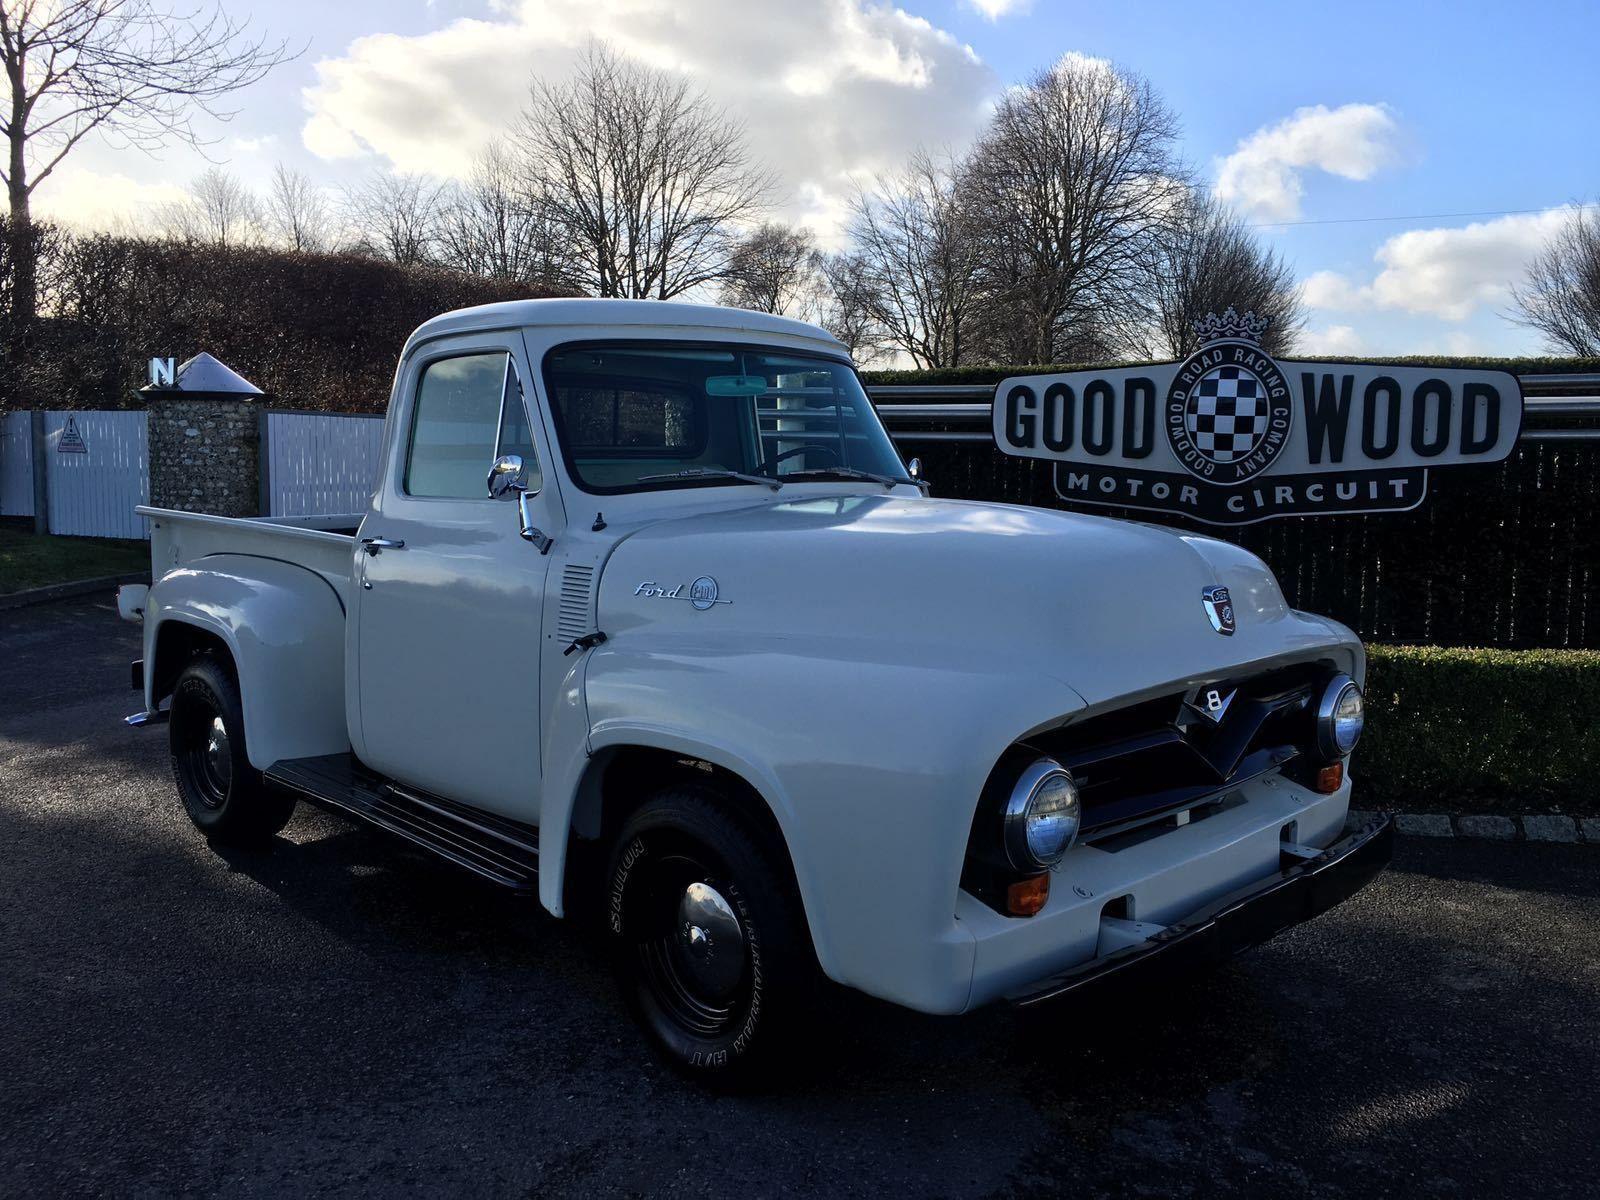 1955 Ford F100 Pick Up Show Truck Hot Rod V8 Trucks And Wagons Rat Ebay 1956